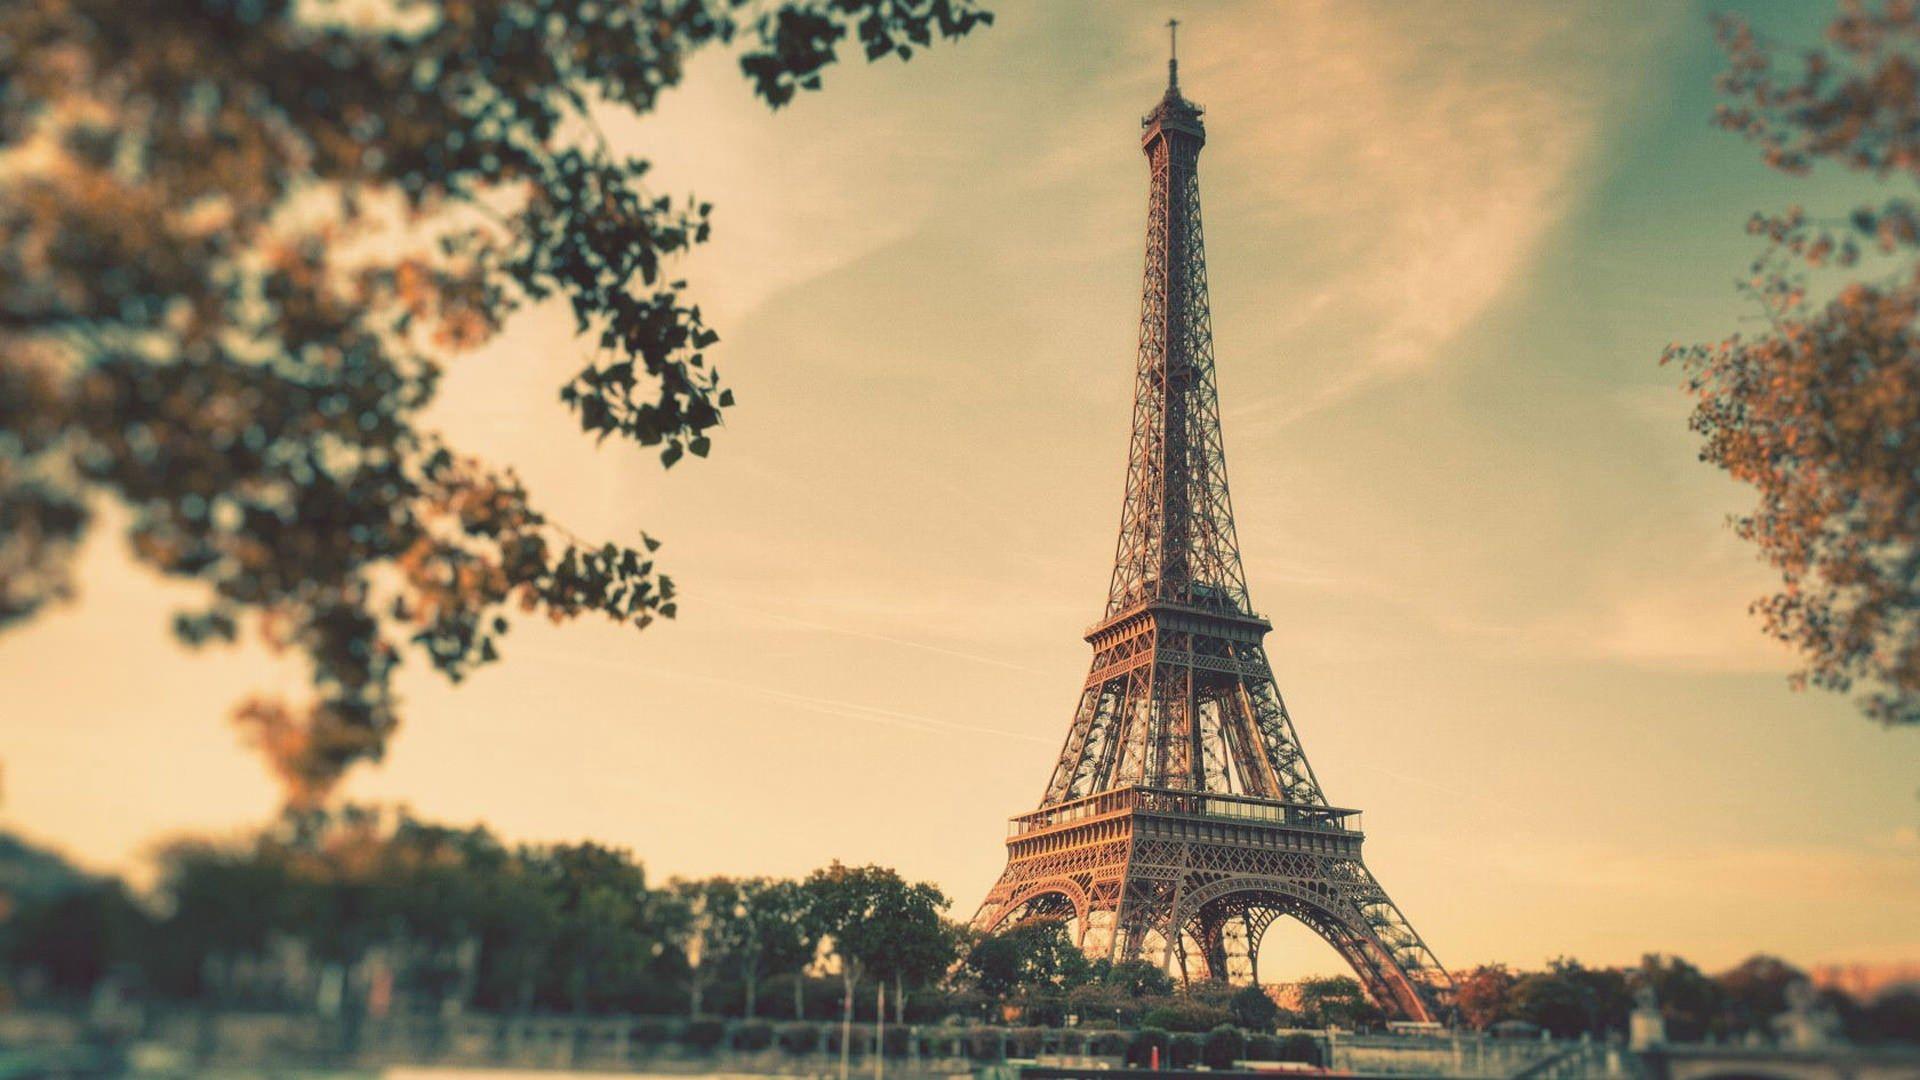 Vintage Eiffel Tower Free Desktop Wallpaper 1920x1080 Eiffel Tower Paris Wallpaper Paris Eiffel Tower